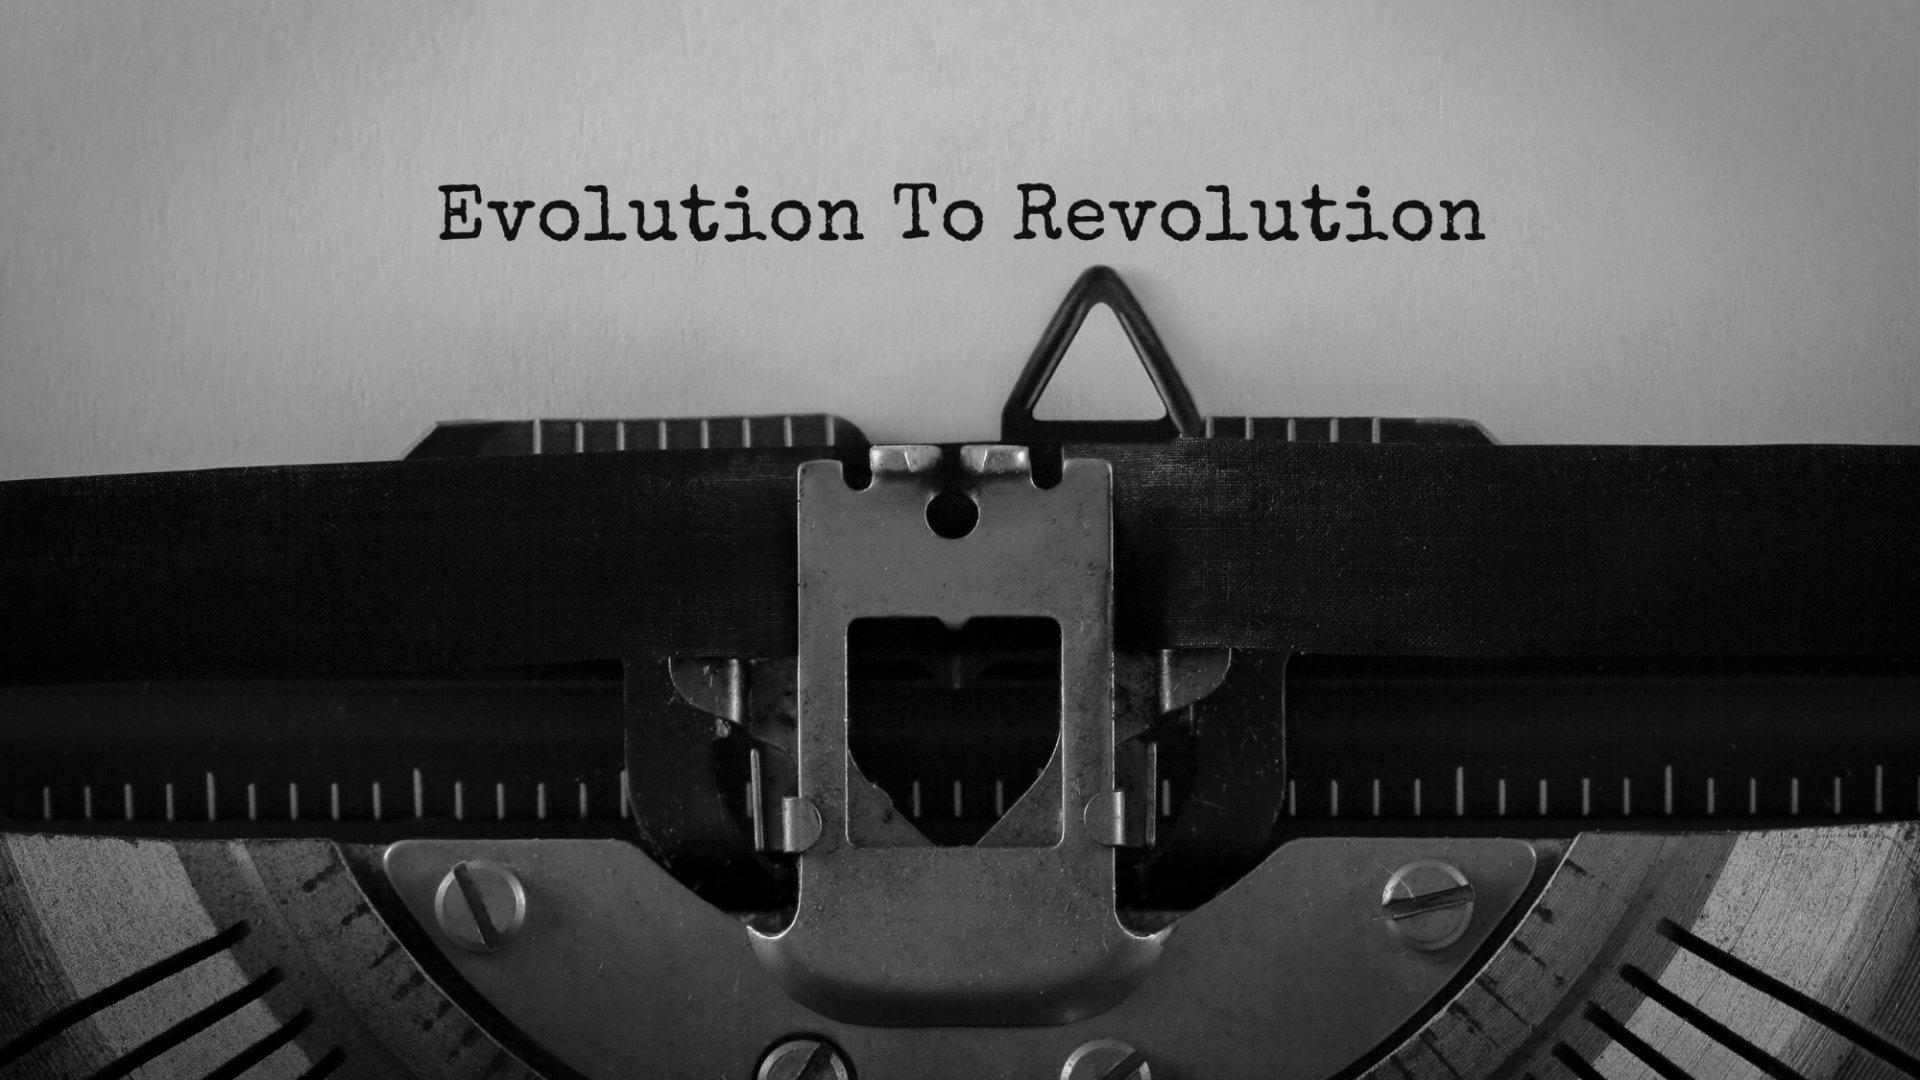 The Evolution of an Enterprise